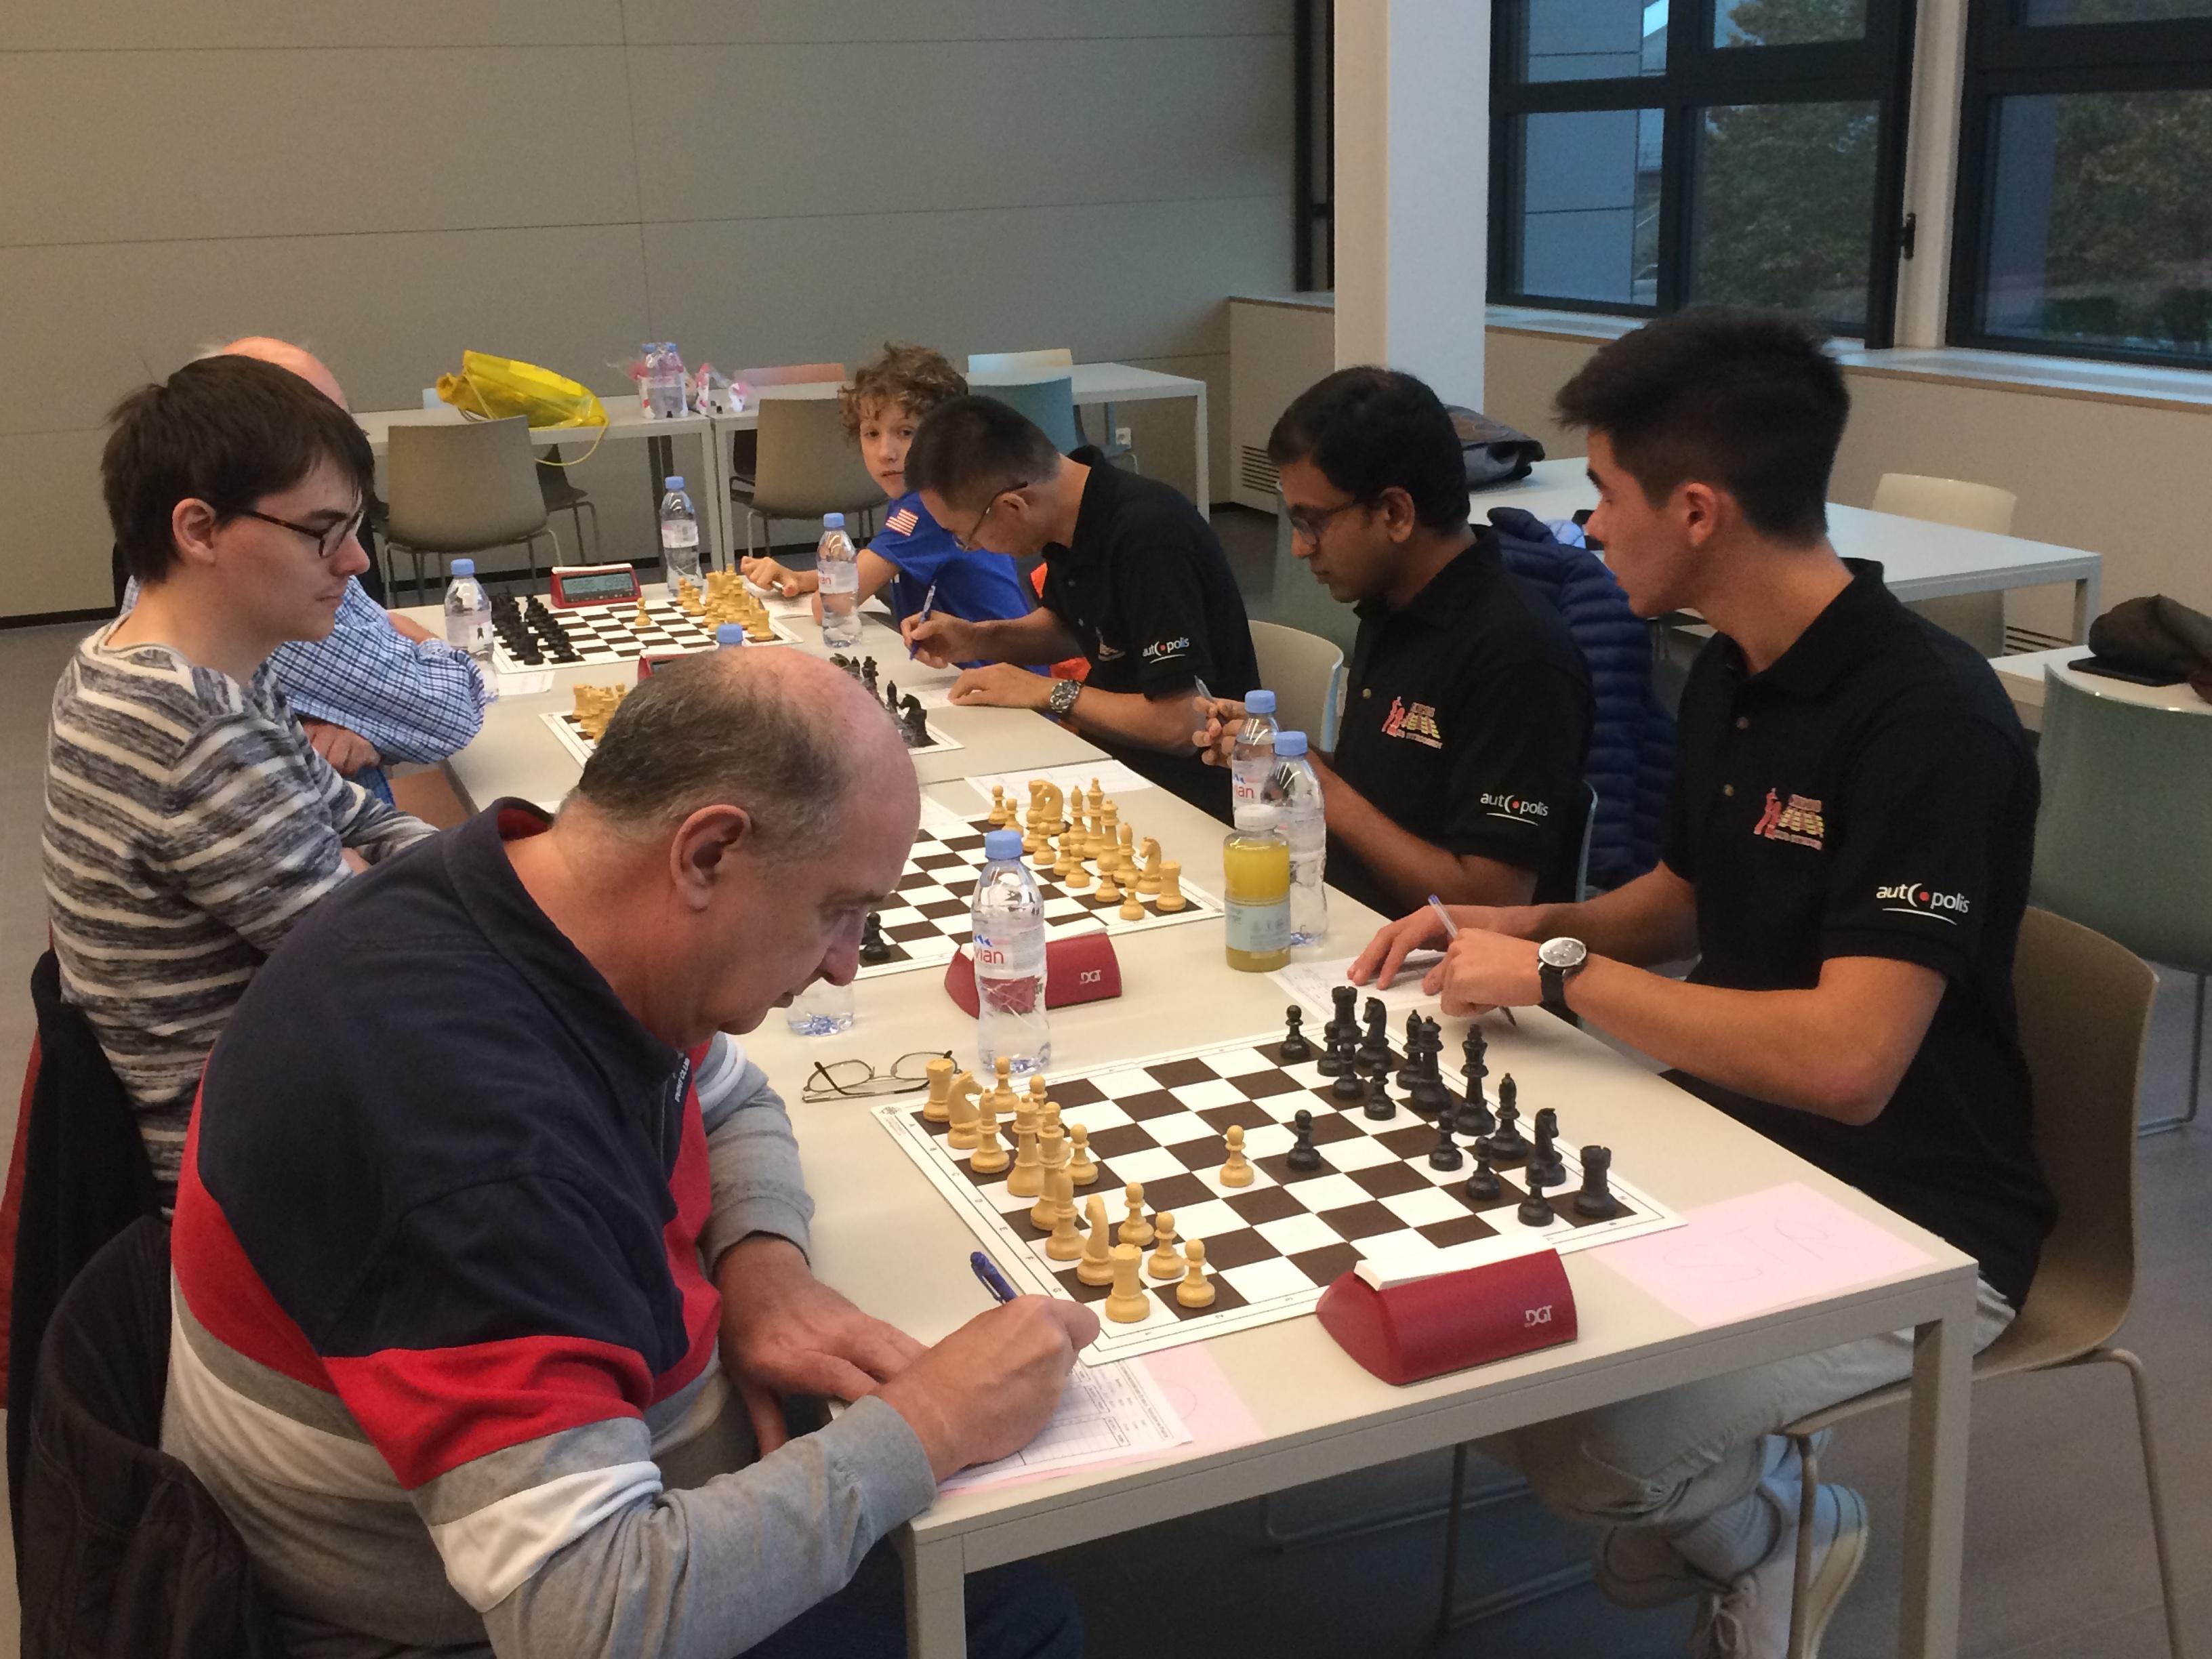 Chess: Strassen wins his 3rd match this season